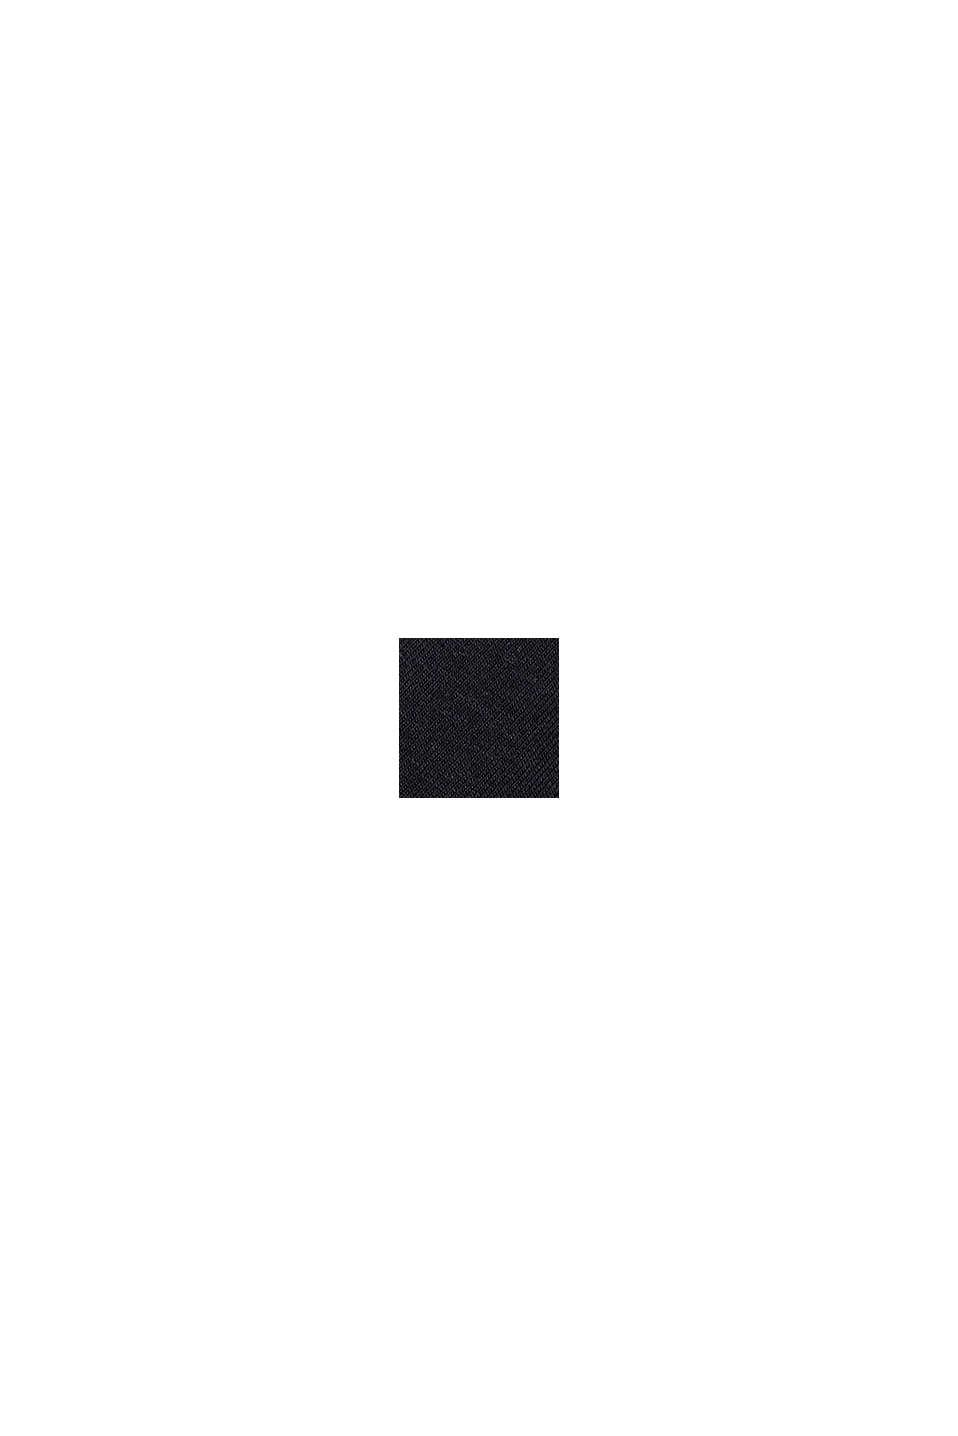 T-shirt effetto a strati, BLACK, swatch